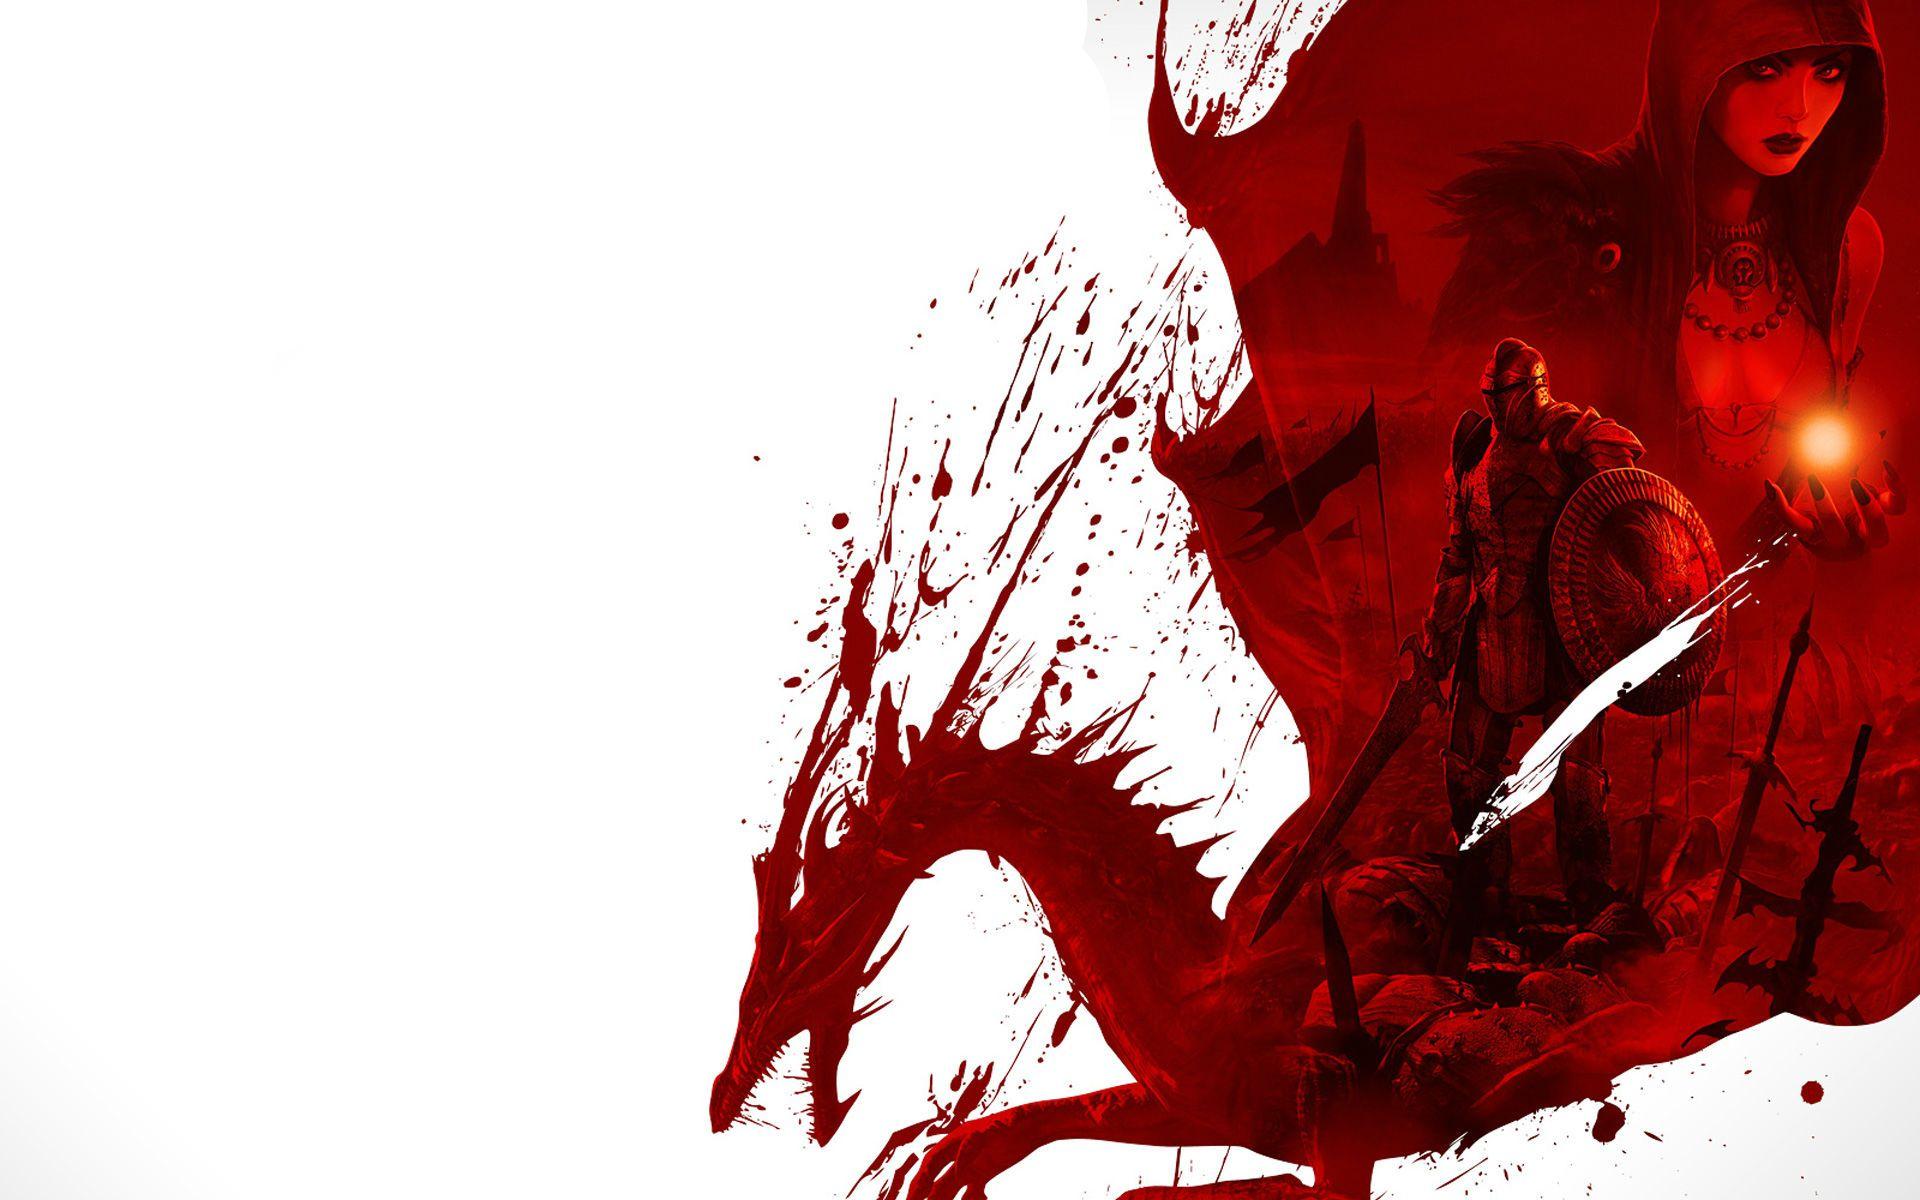 New Dragon Age In Development Https Www Gamesagainstmachines Com New Dragon Age Development Utm Campaign Crowdfire Utm Content Crowdfire Utm Medium Social Ut